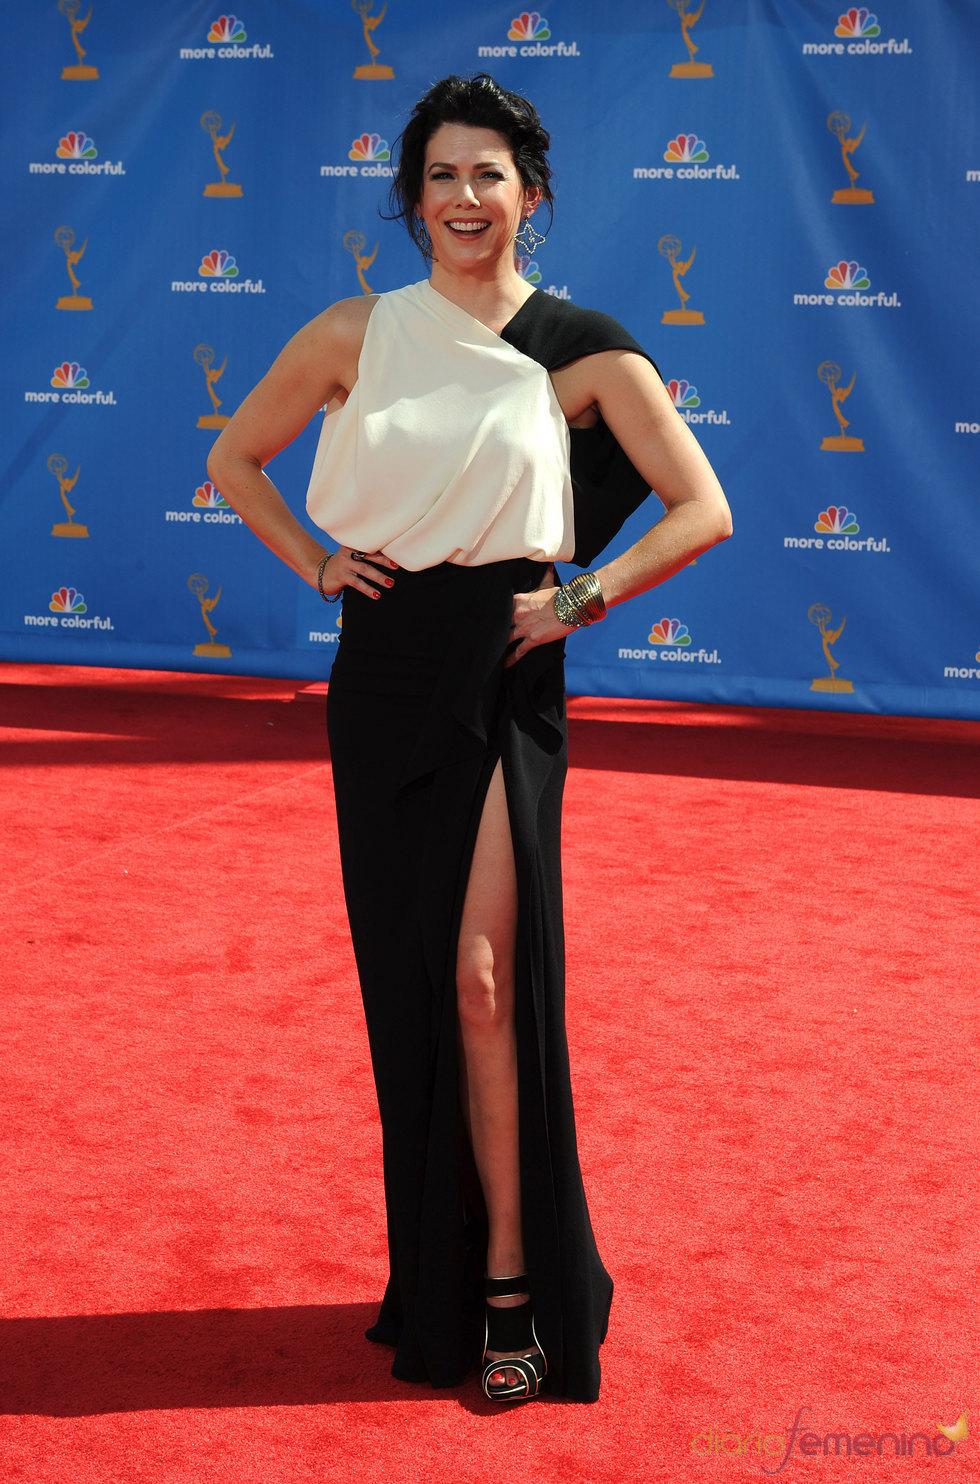 Lauren Graham en los premios Emmy 2010